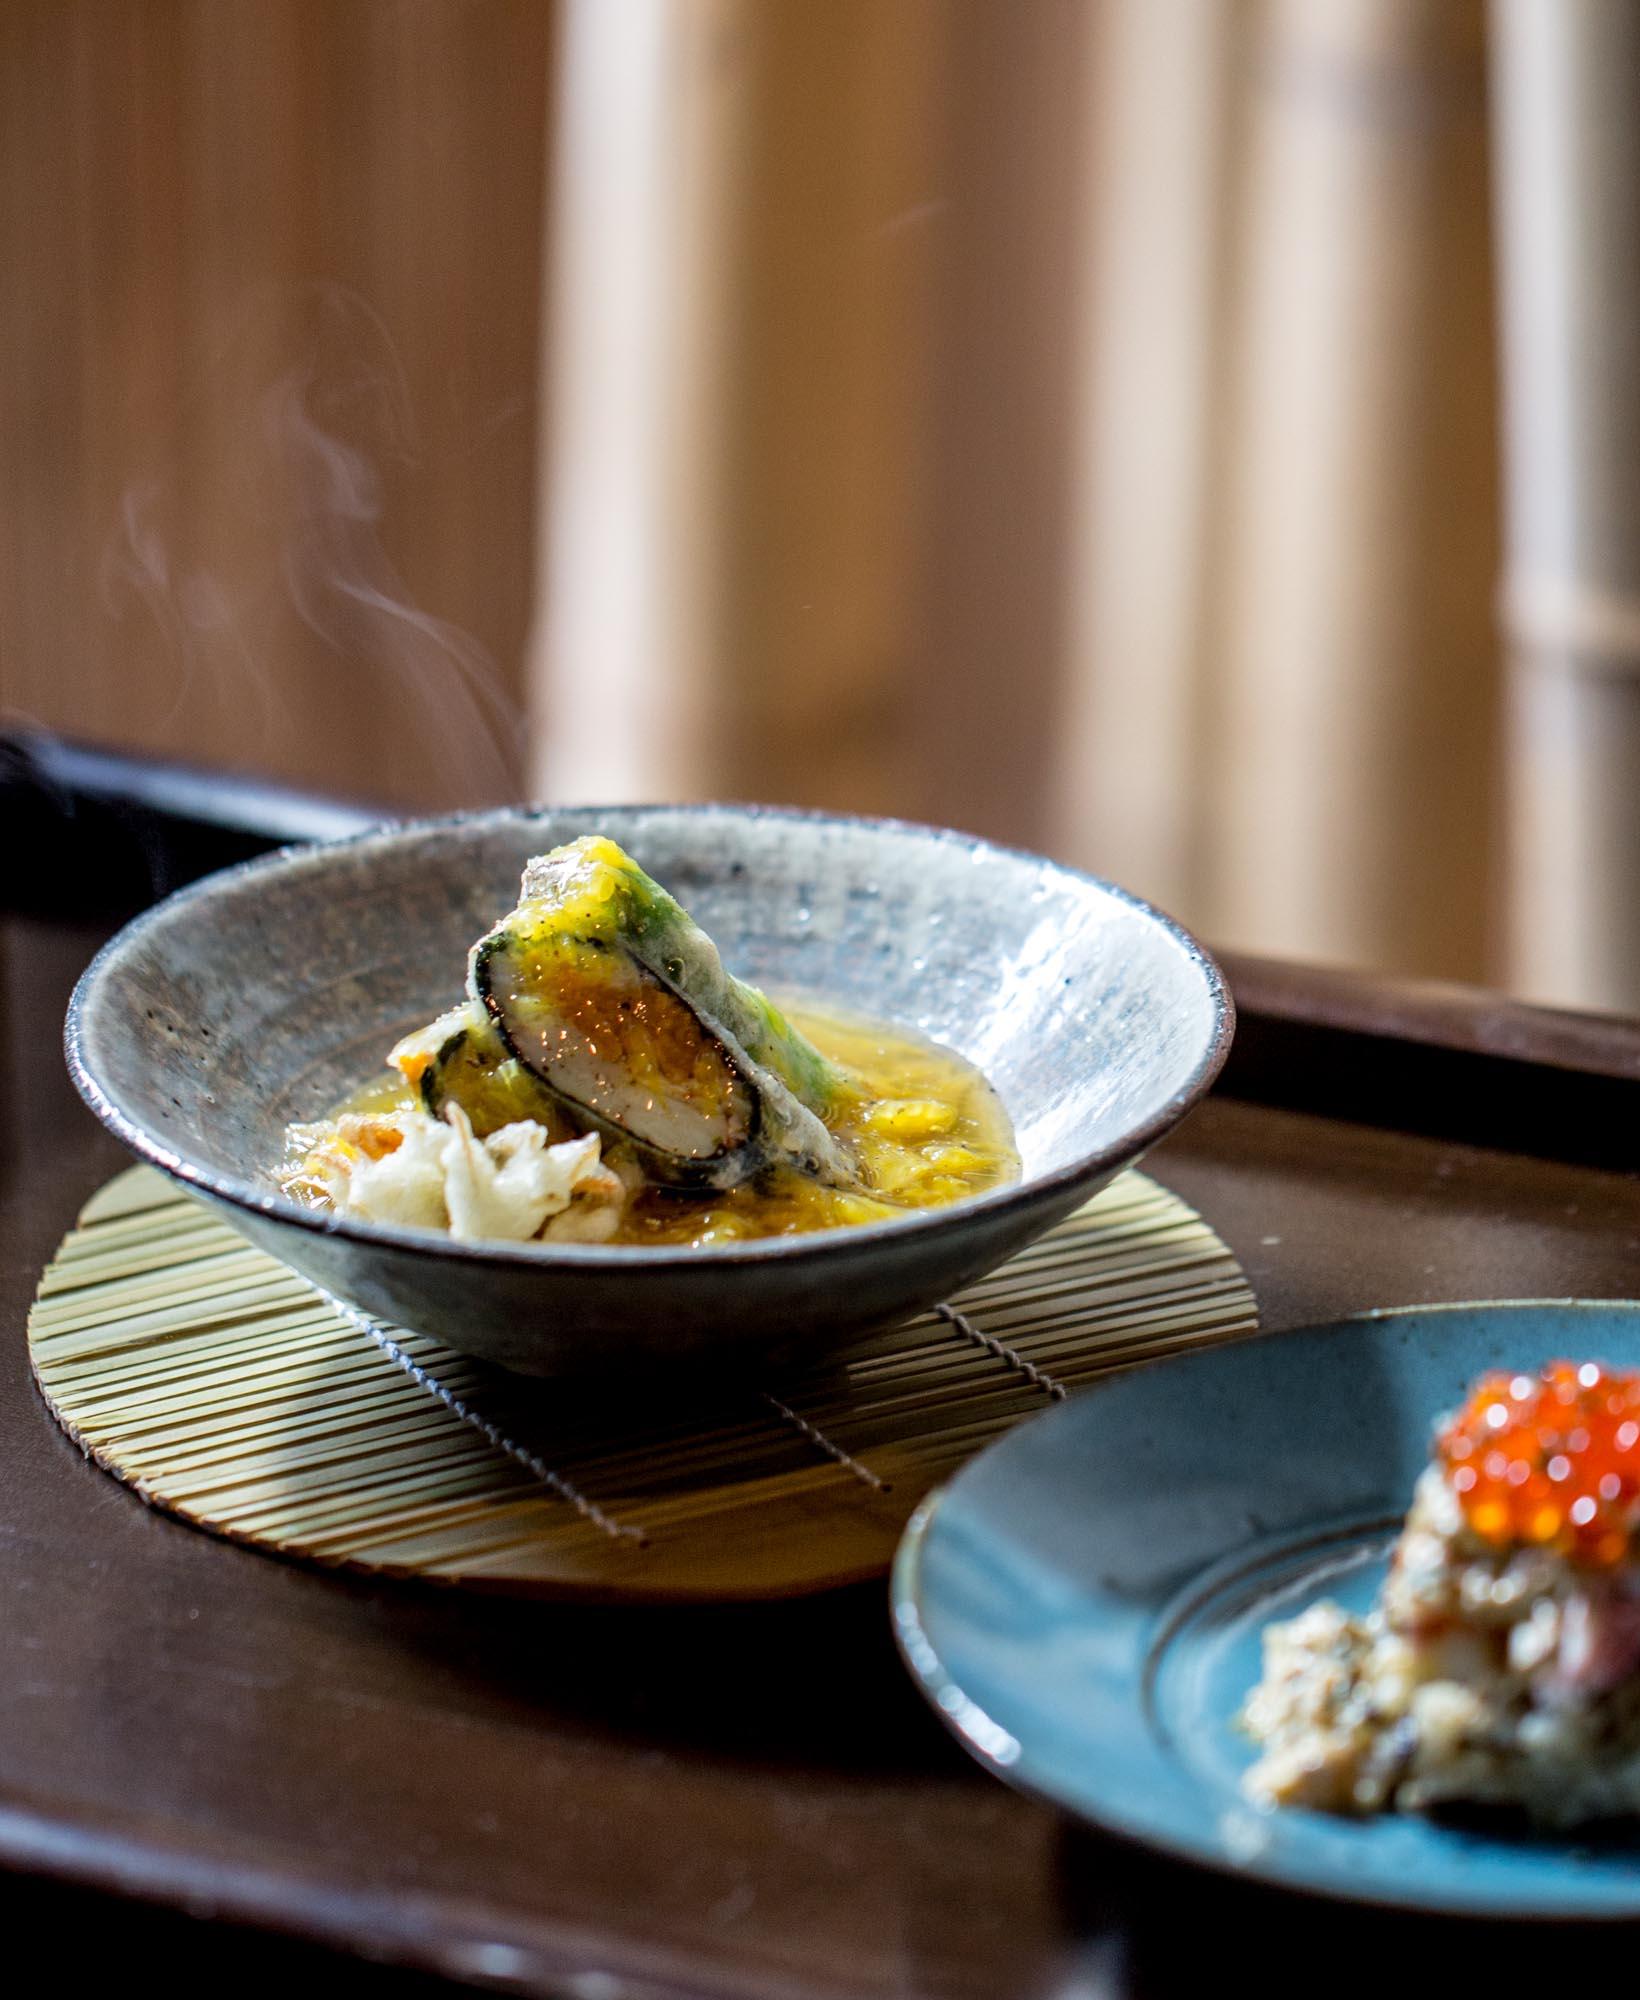 Hairy crab and sea urchin nori roll with orange ankake - Kappo Okada, Hokkaido